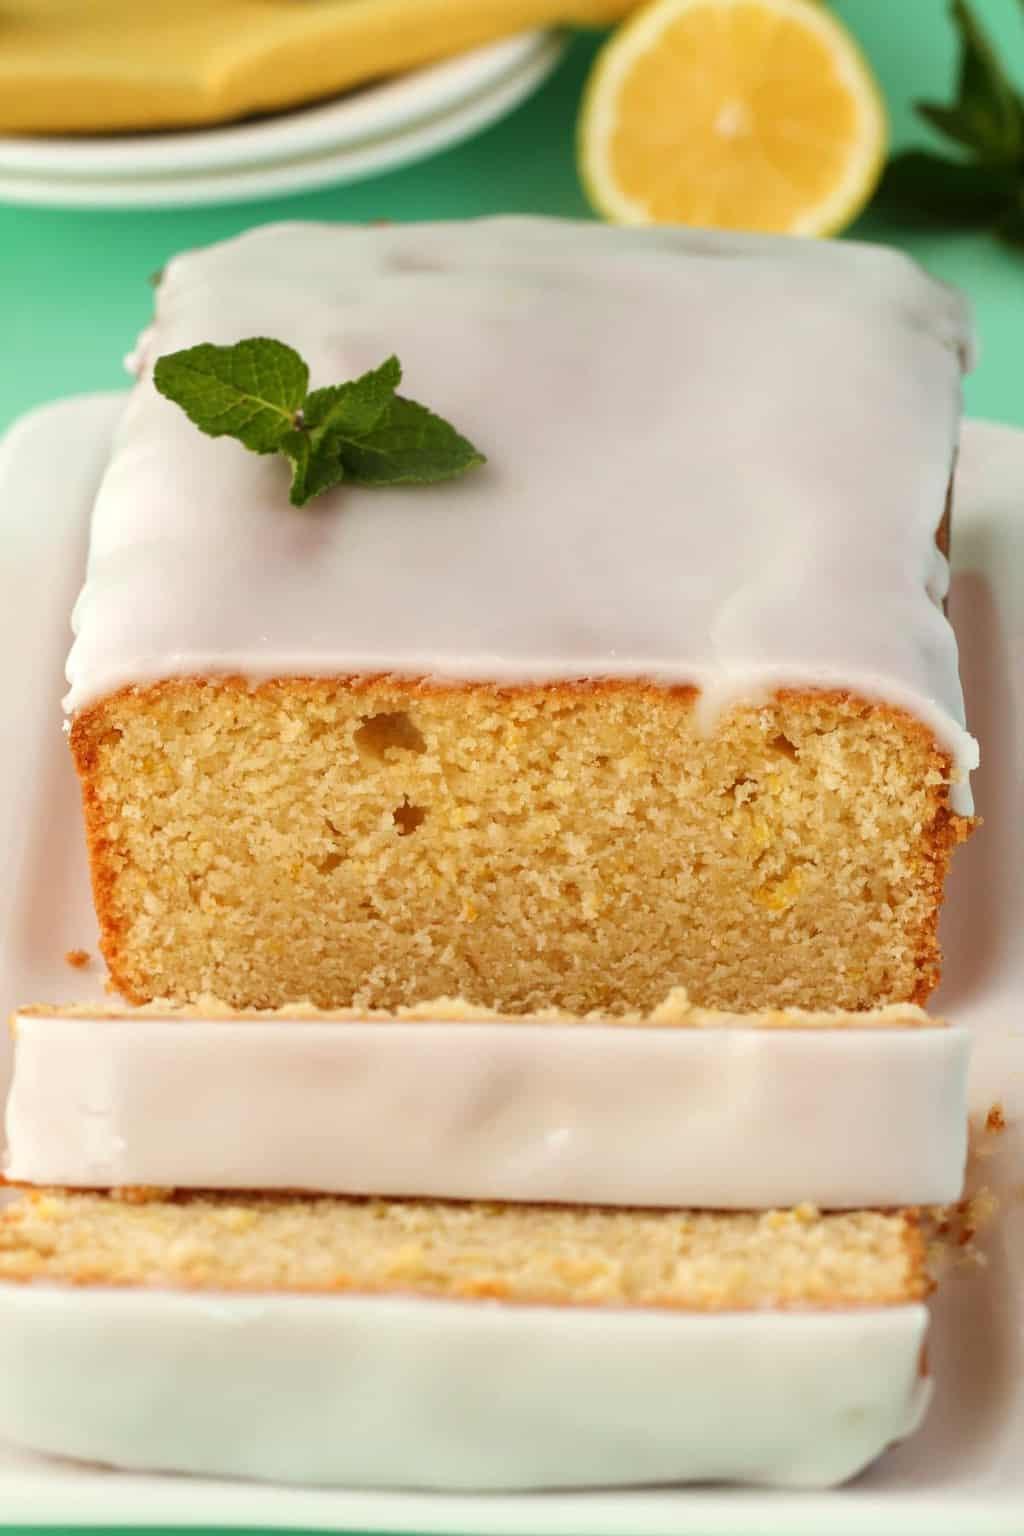 Vegan Lemon Pound Cake  Vegan Lemon Pound Cake with Lemon Glaze Loving It Vegan